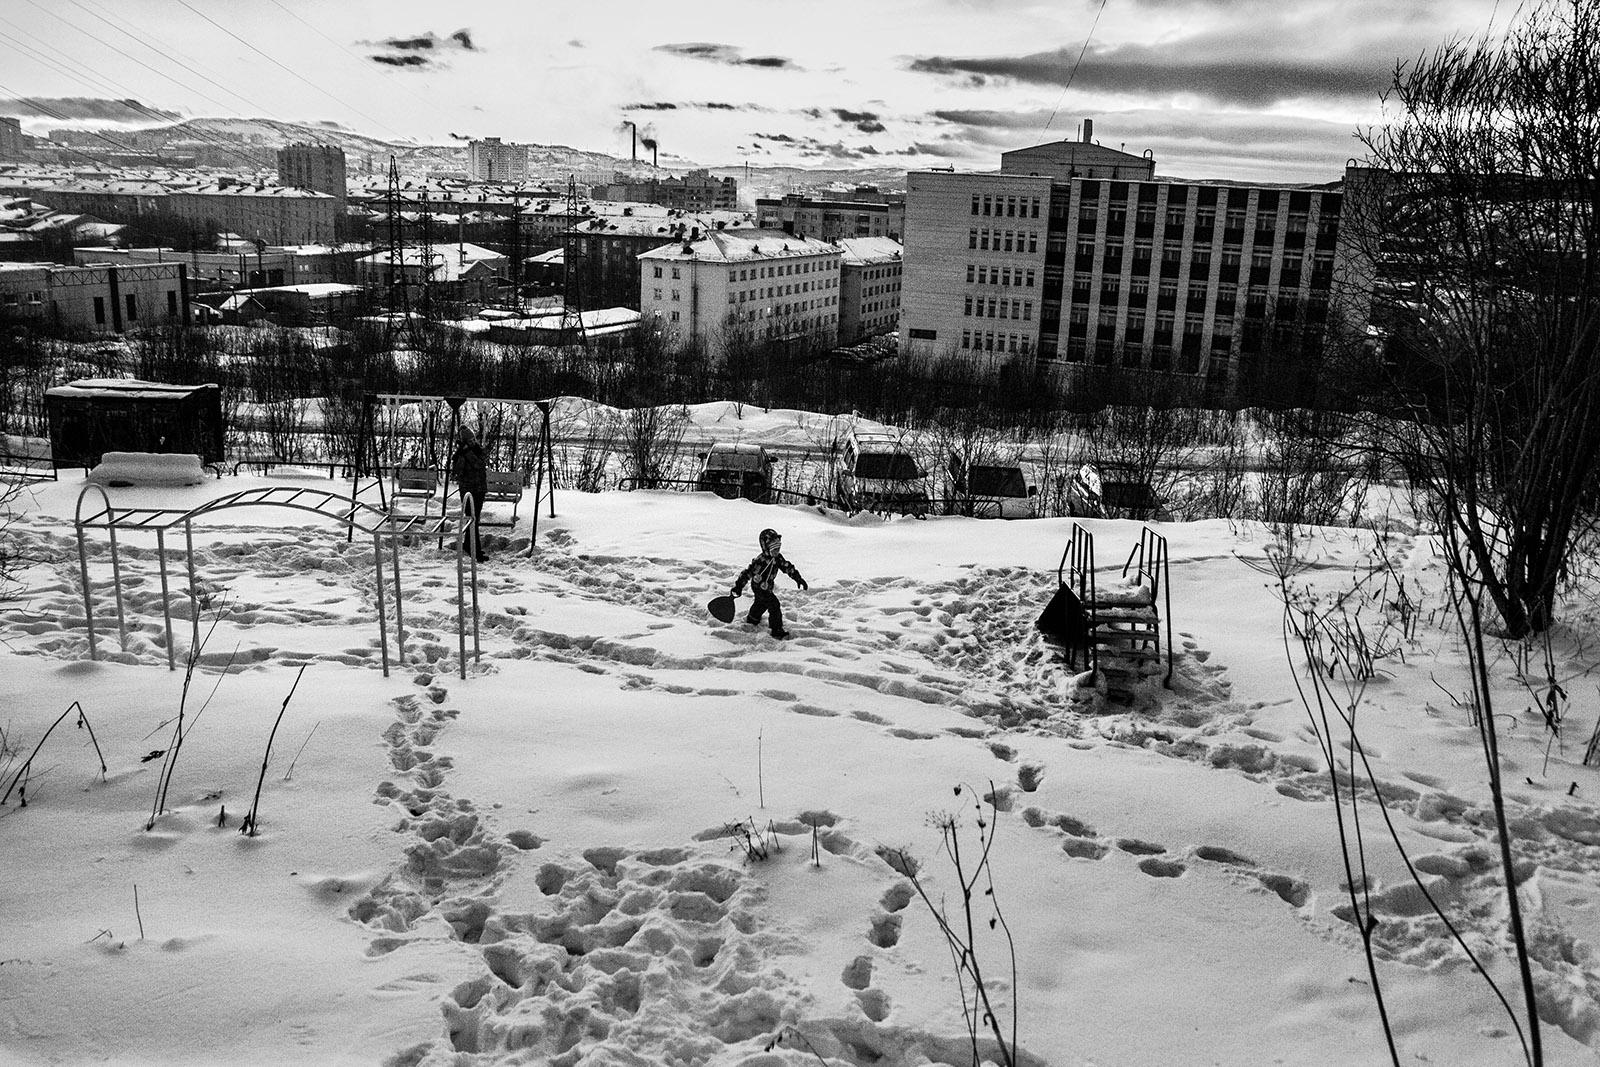 Мурманск, Мурманская область   Murmansk, Murmansk region, 2016.